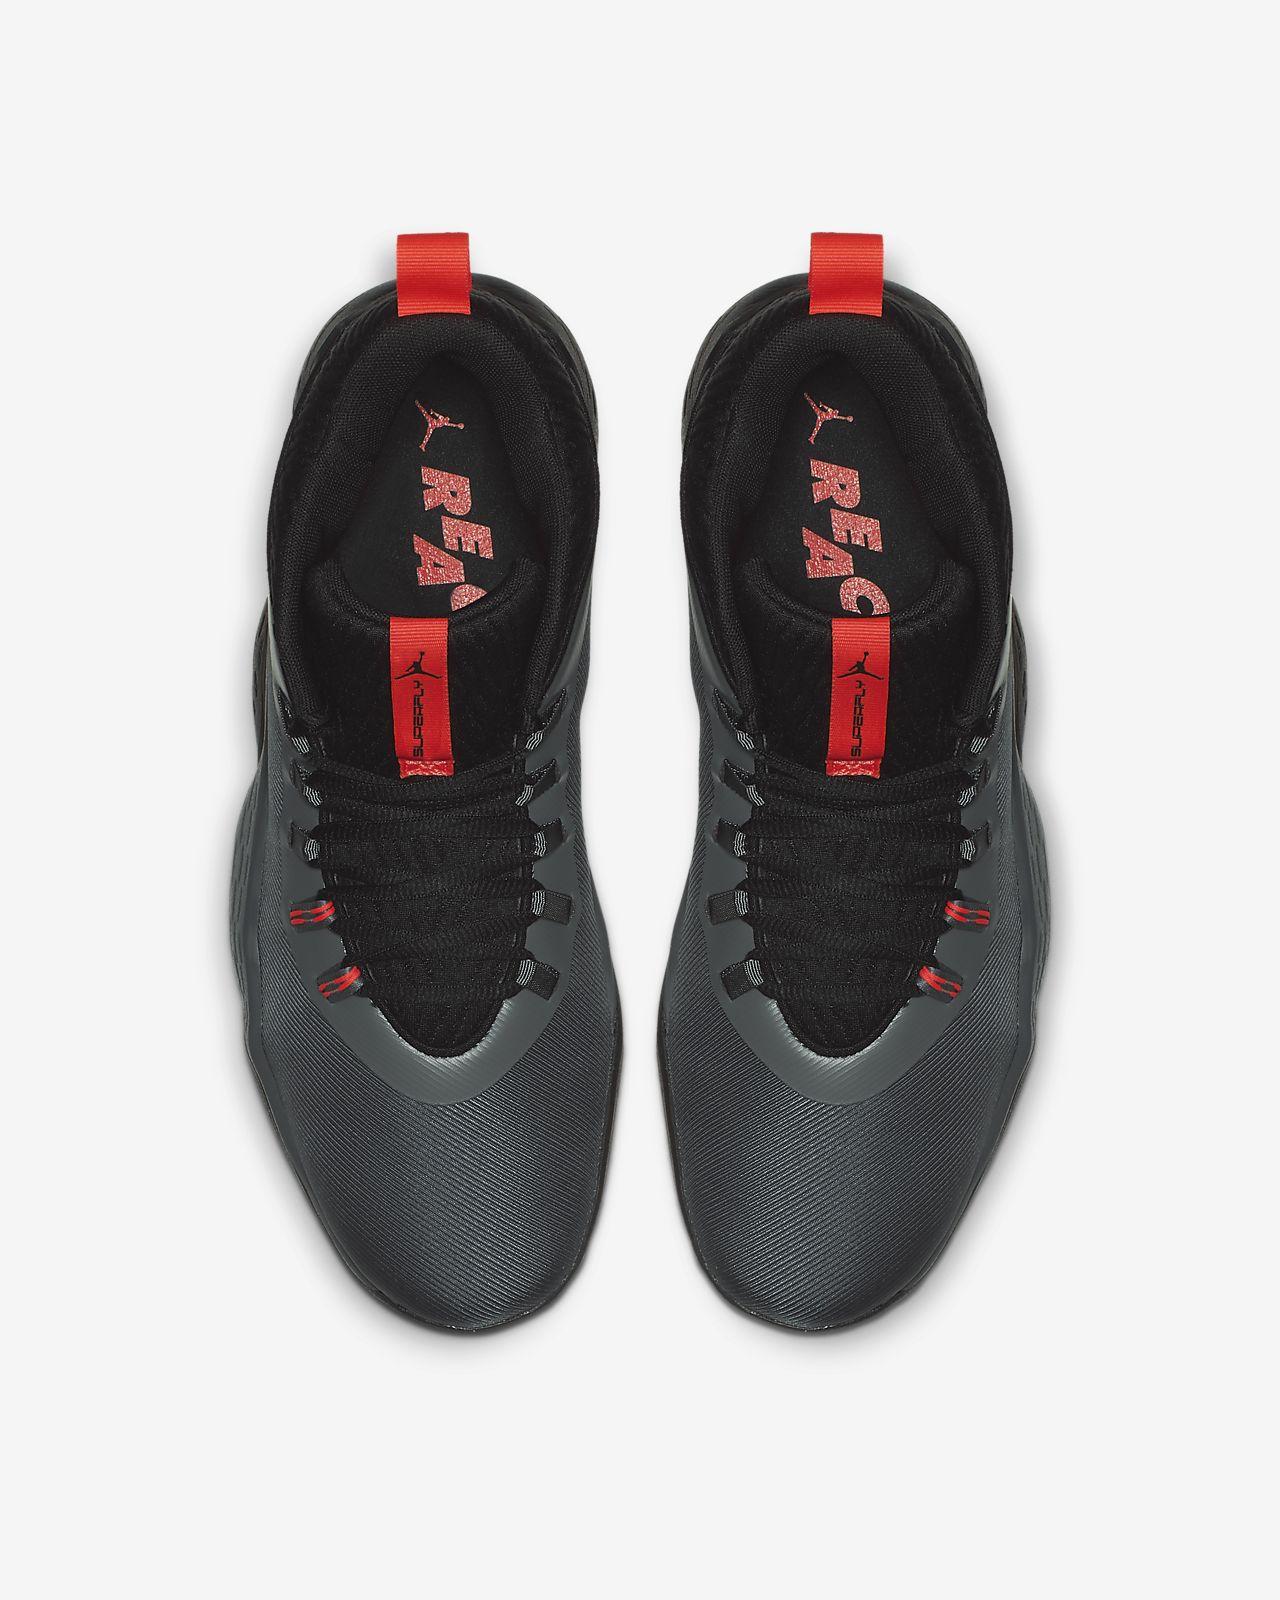 294cc1665ba2 Fly MVP Low Men's Basketball Shoe Jordan Super.Fly MVP Low Men's Basketball  Shoe